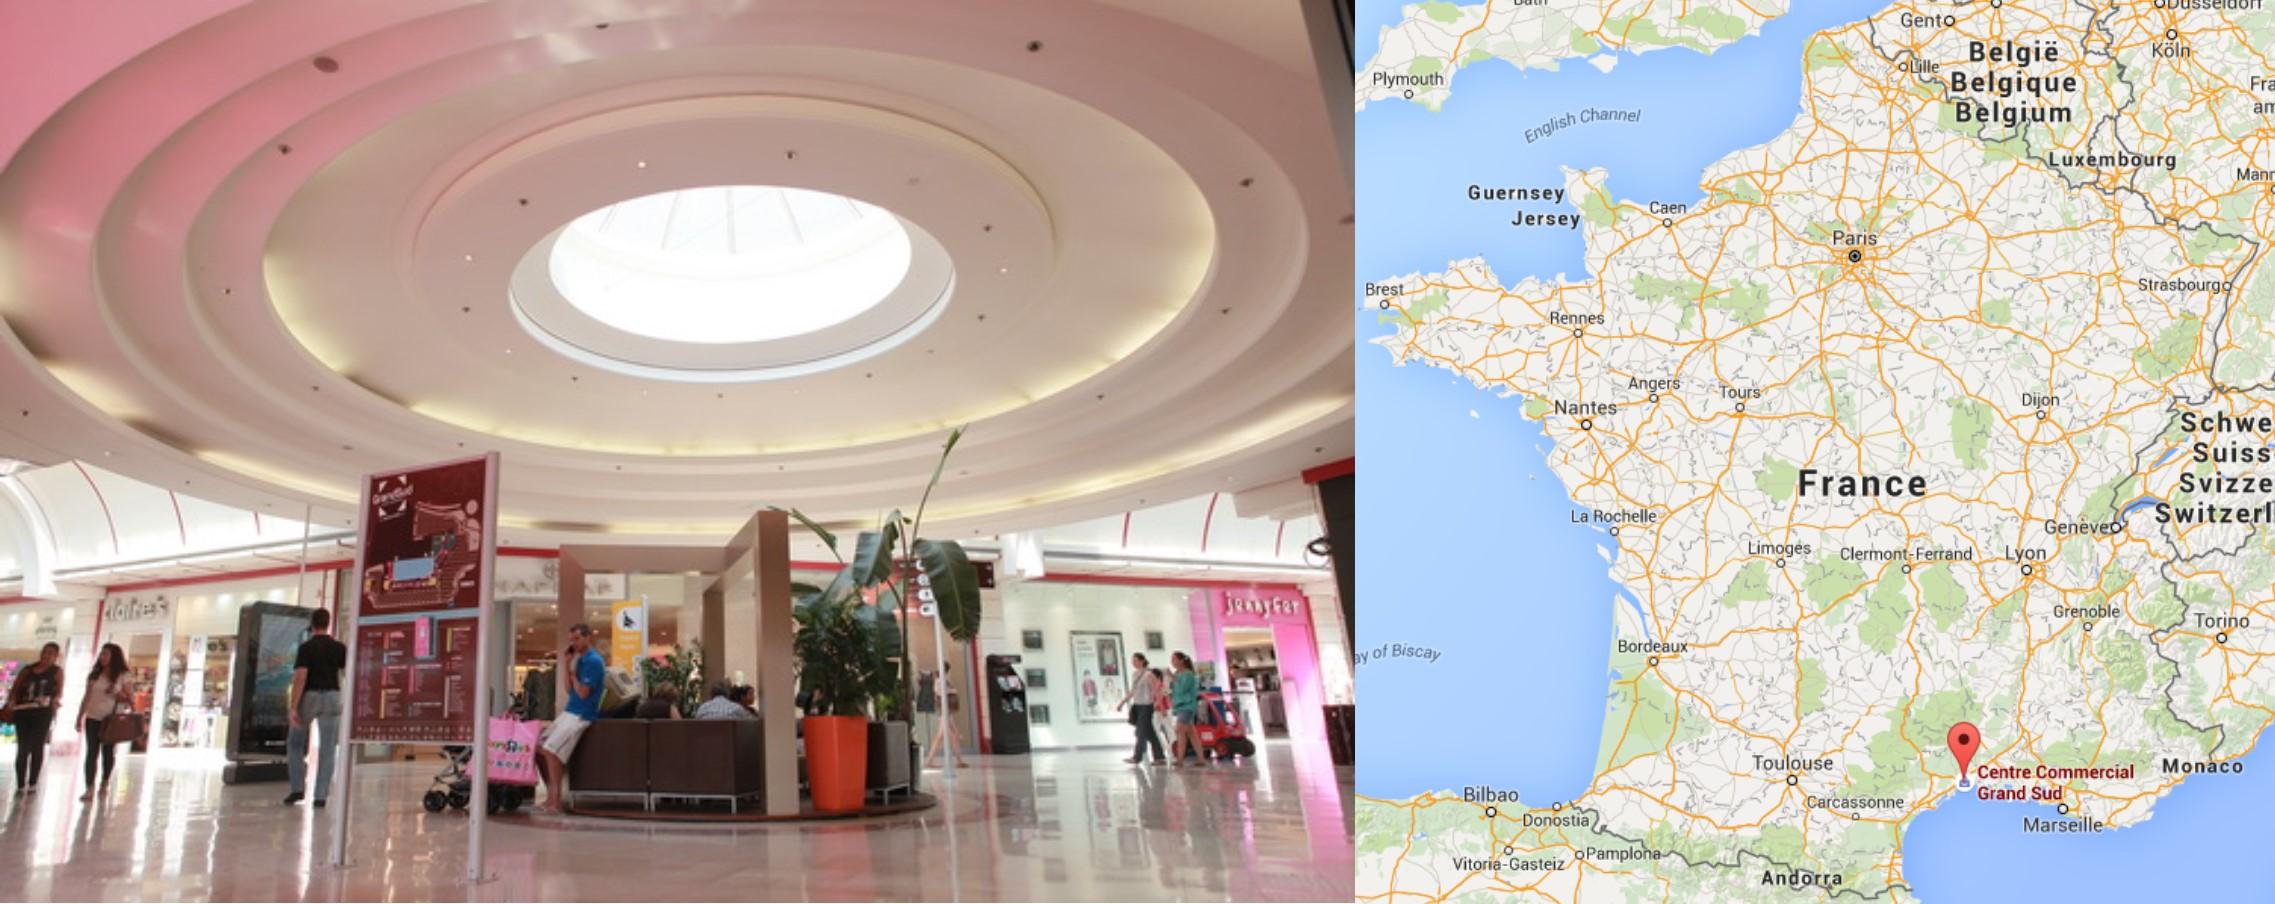 Centre commercial Grand Sud